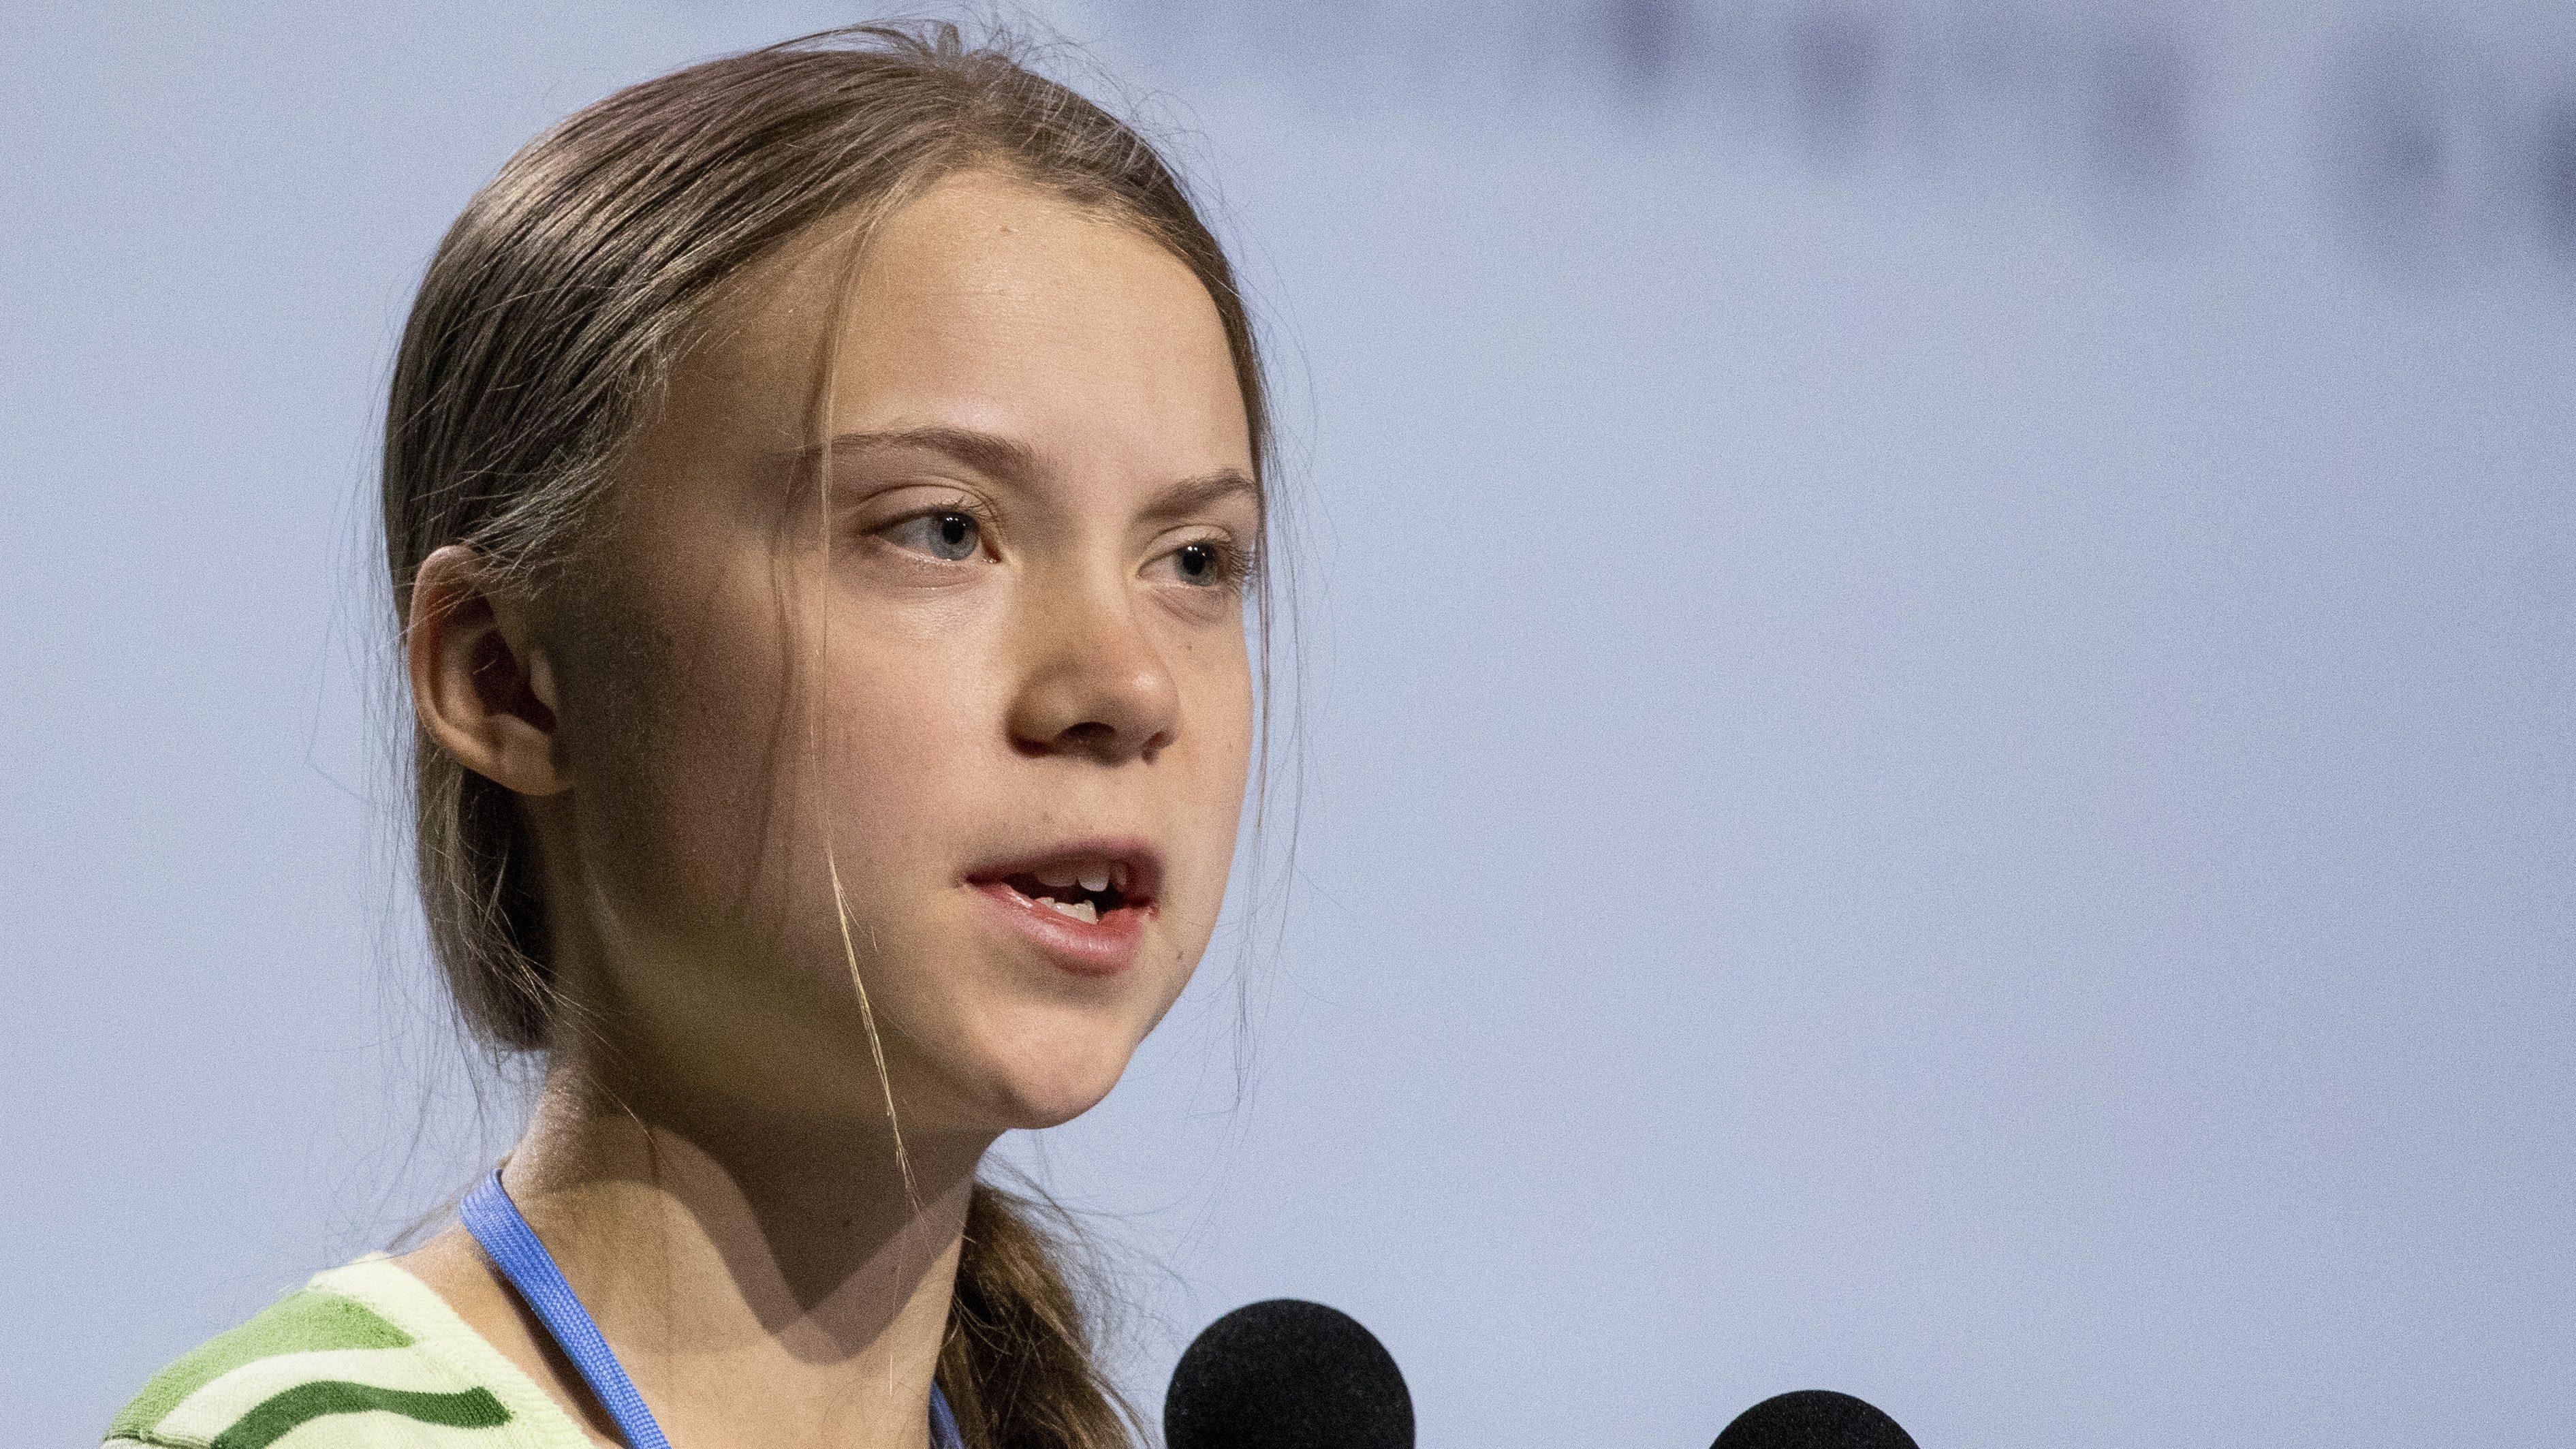 Greta Thunberg speaks at COP25